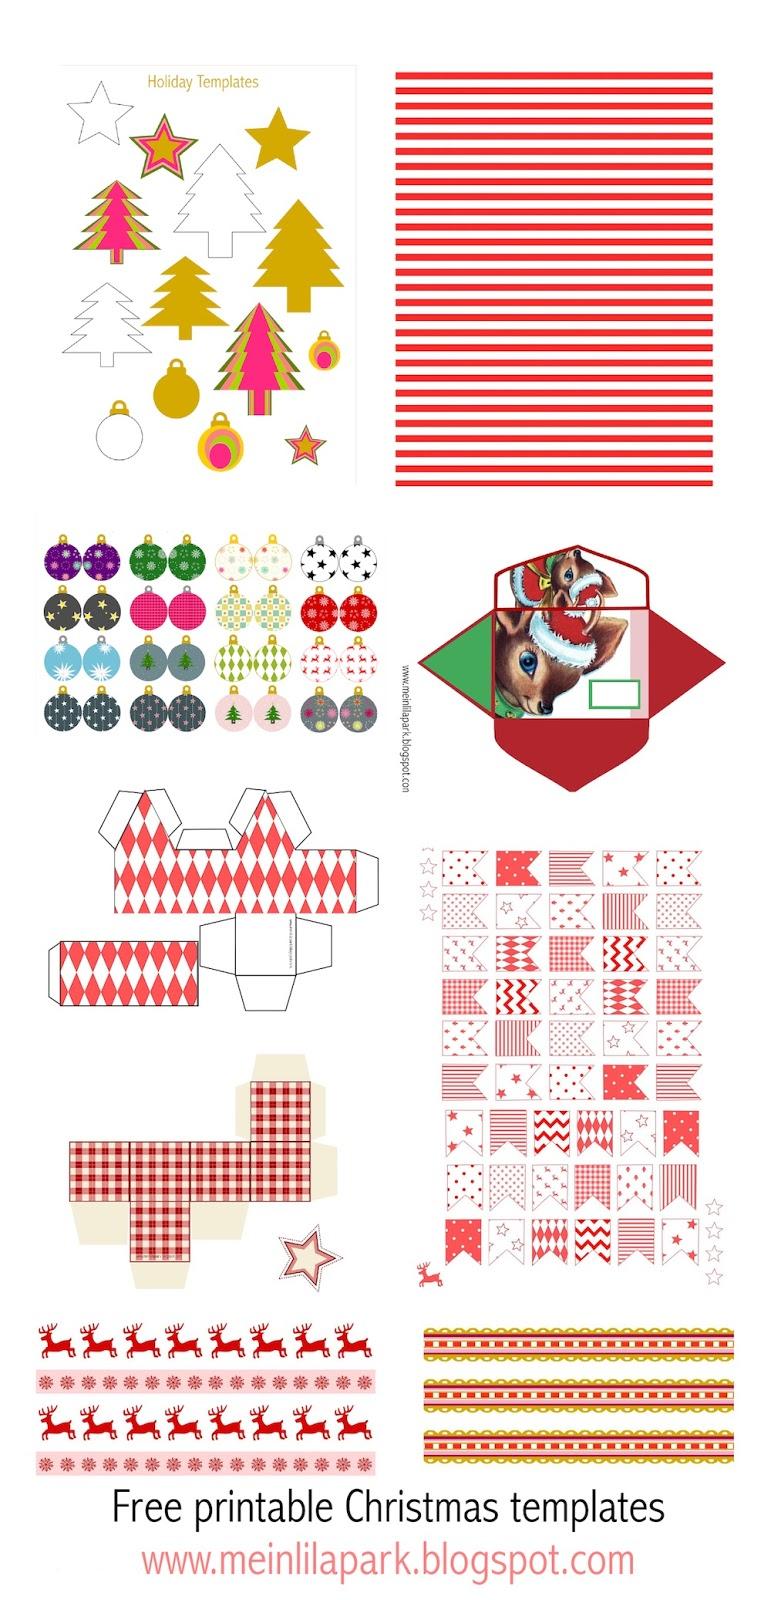 Free printable Christmas templates - Weihnachten DIY ...